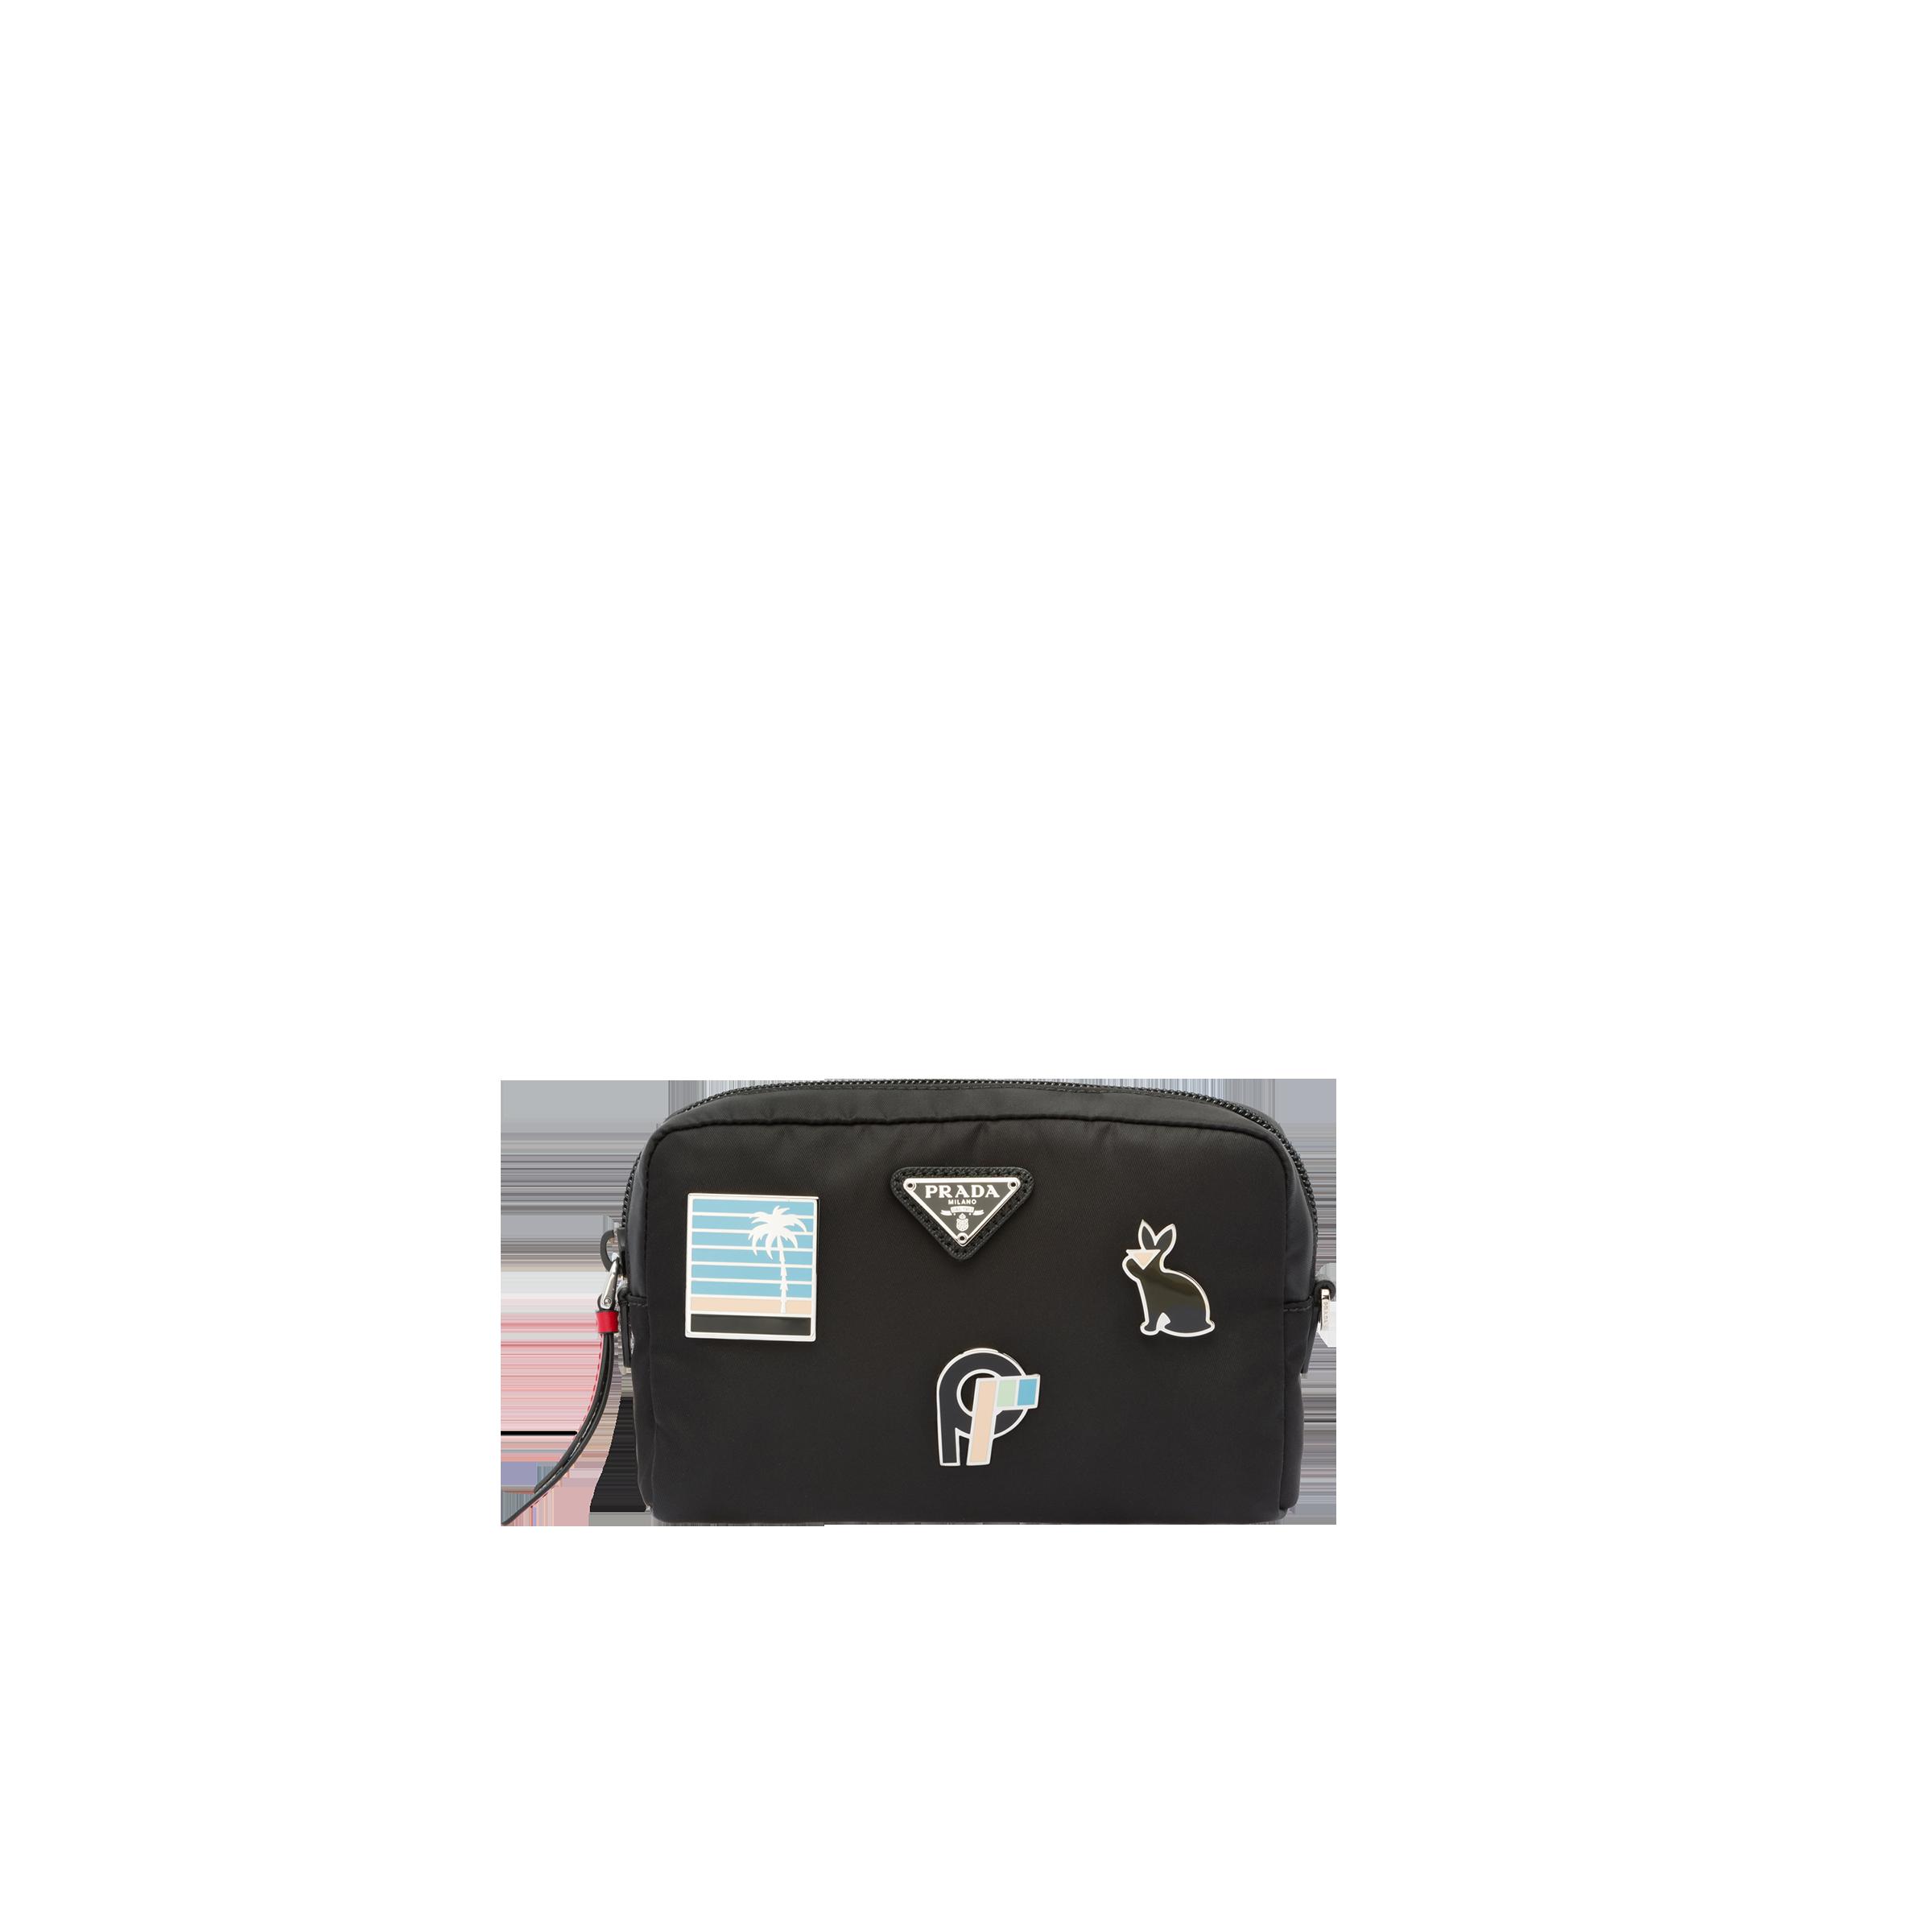 a7967d8631d5 Nylon logo pouch   Prada - 1NE021_2CCB_F0002